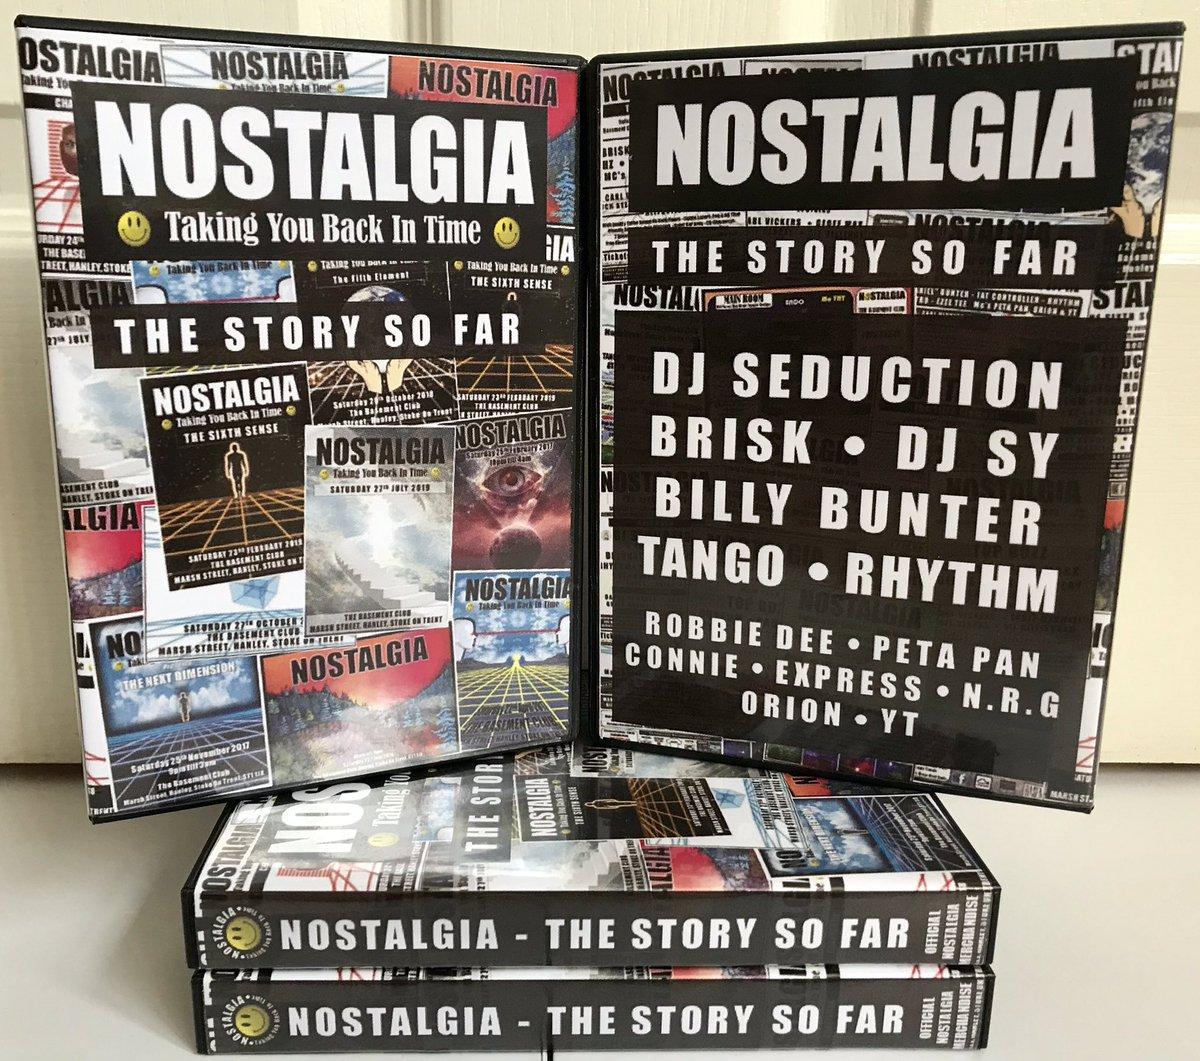 Nostalgia - The Story So Far..  £20 delivered  #nostalgia #rave #oldskool #cdpack #djseduction #djbrisk #djsy #billybunter #tango #djrhythm #retro #memorabilia #robbiedee #petapan #connie #support #merchandise #techno #story #buy #purchase #payday #flyer #poster #flyers #hardcore